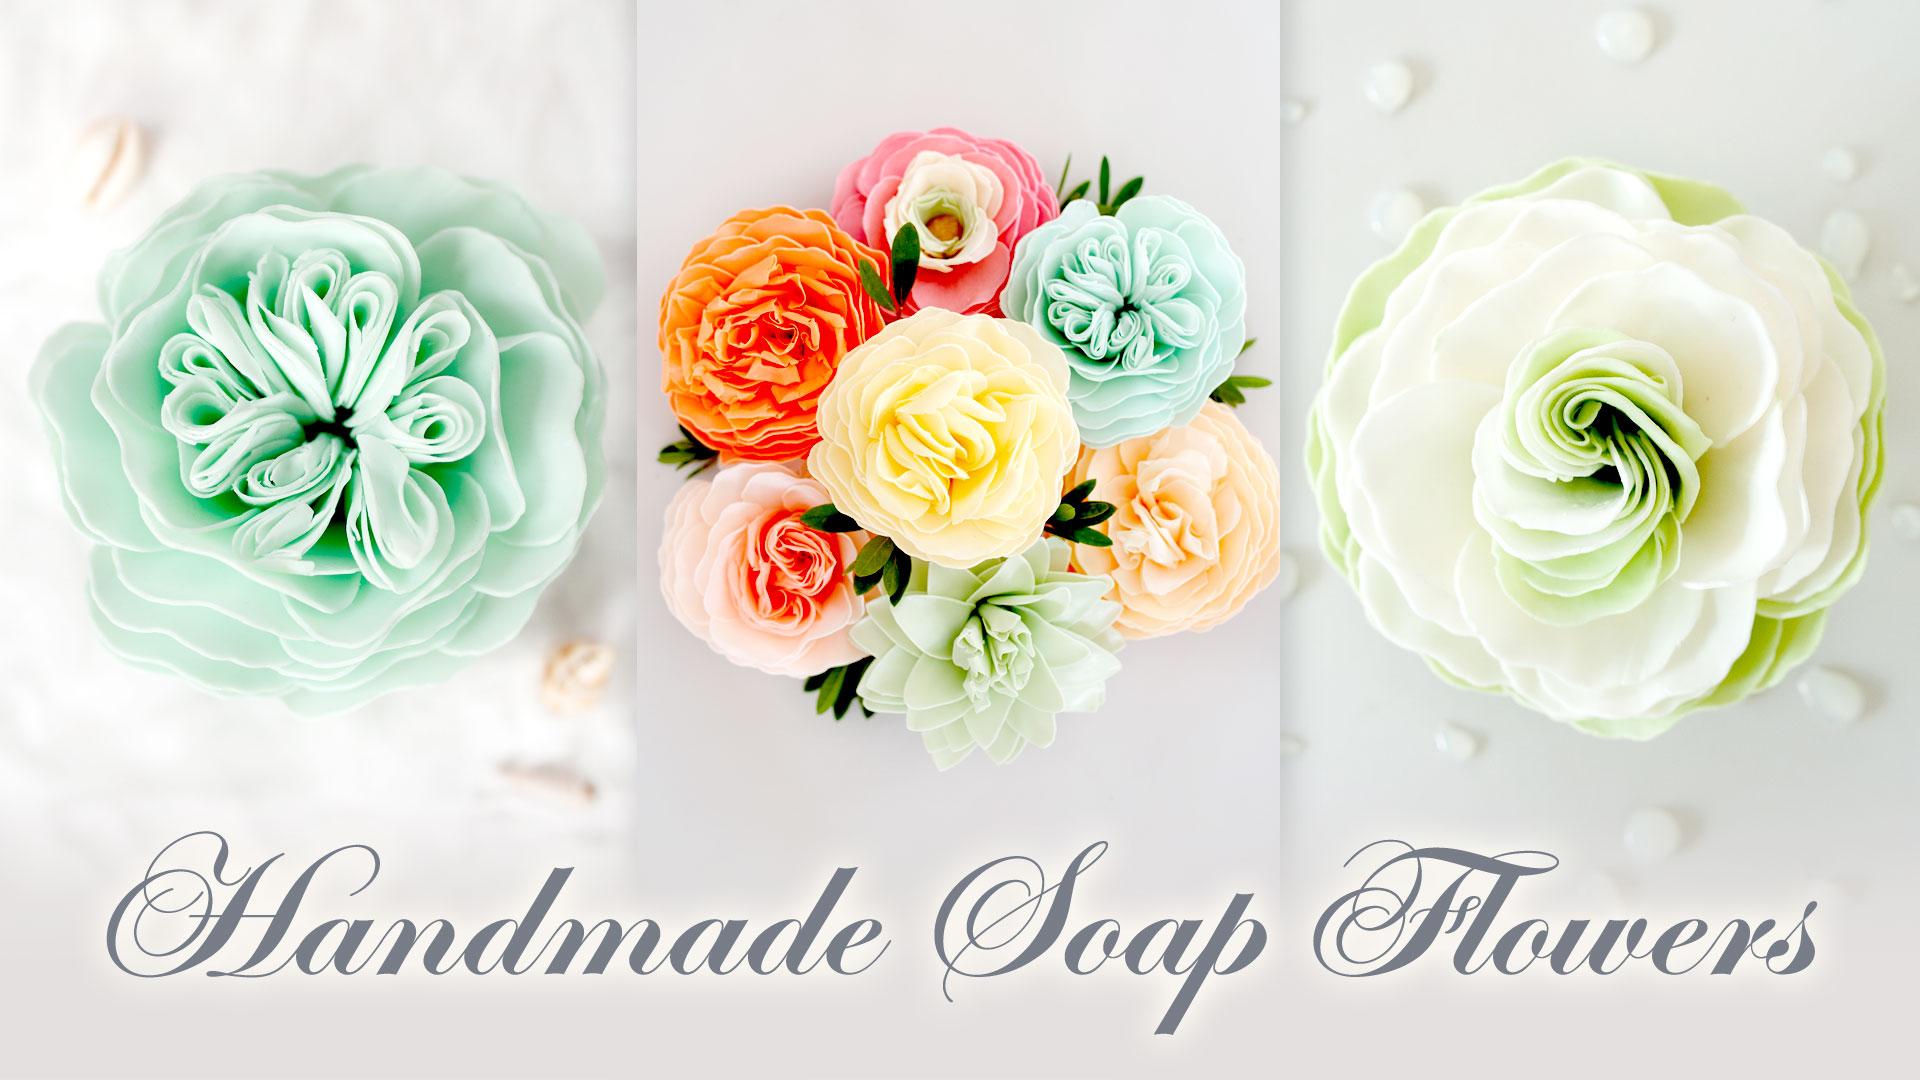 Handmade Soap Flowers - A'marie's Bath Flowers